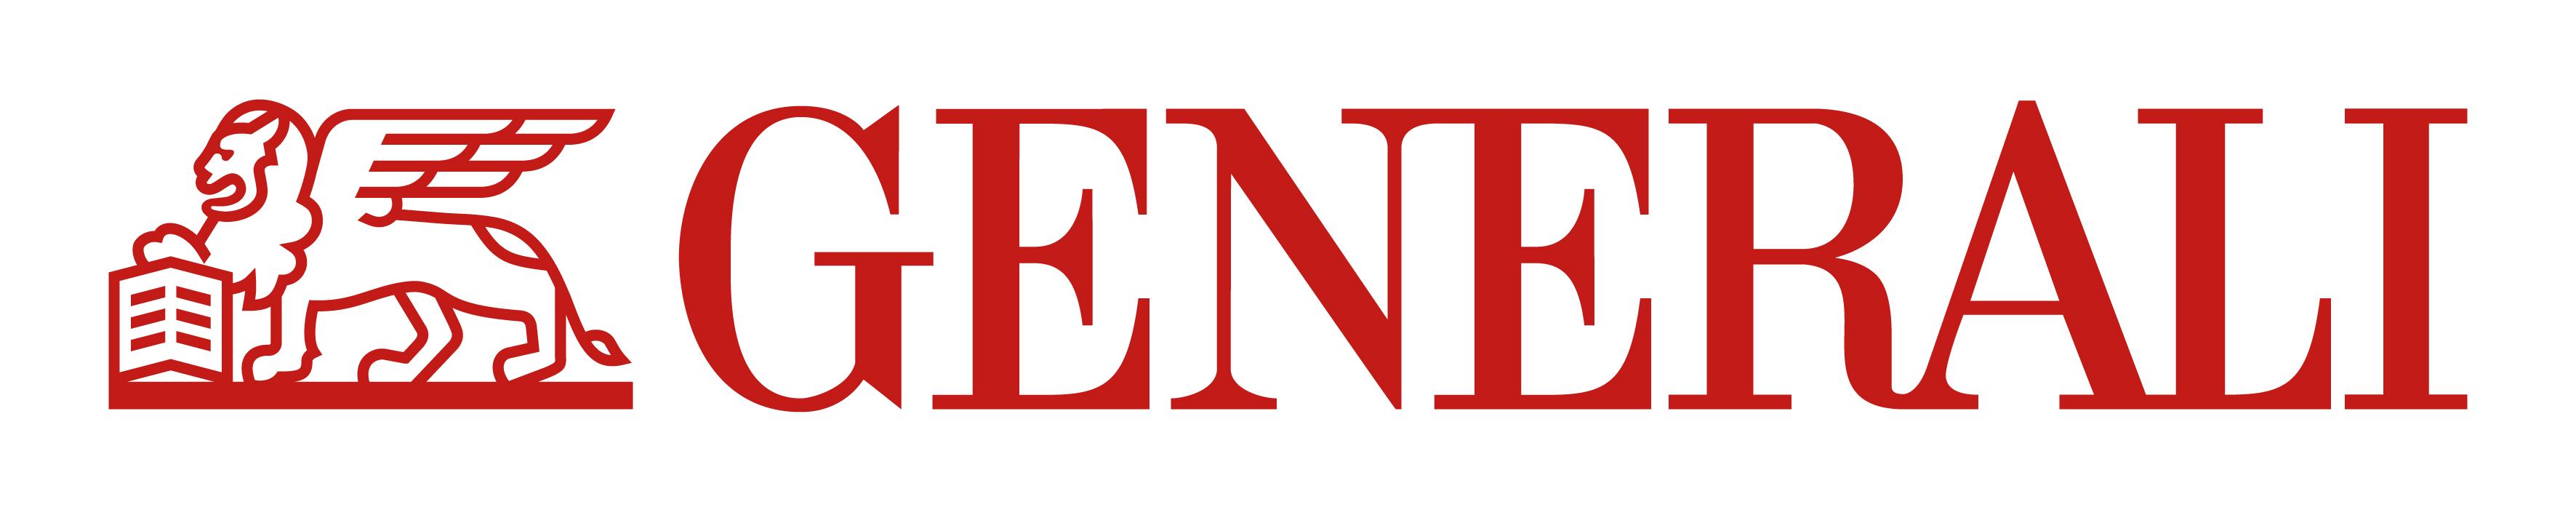 logo-generali